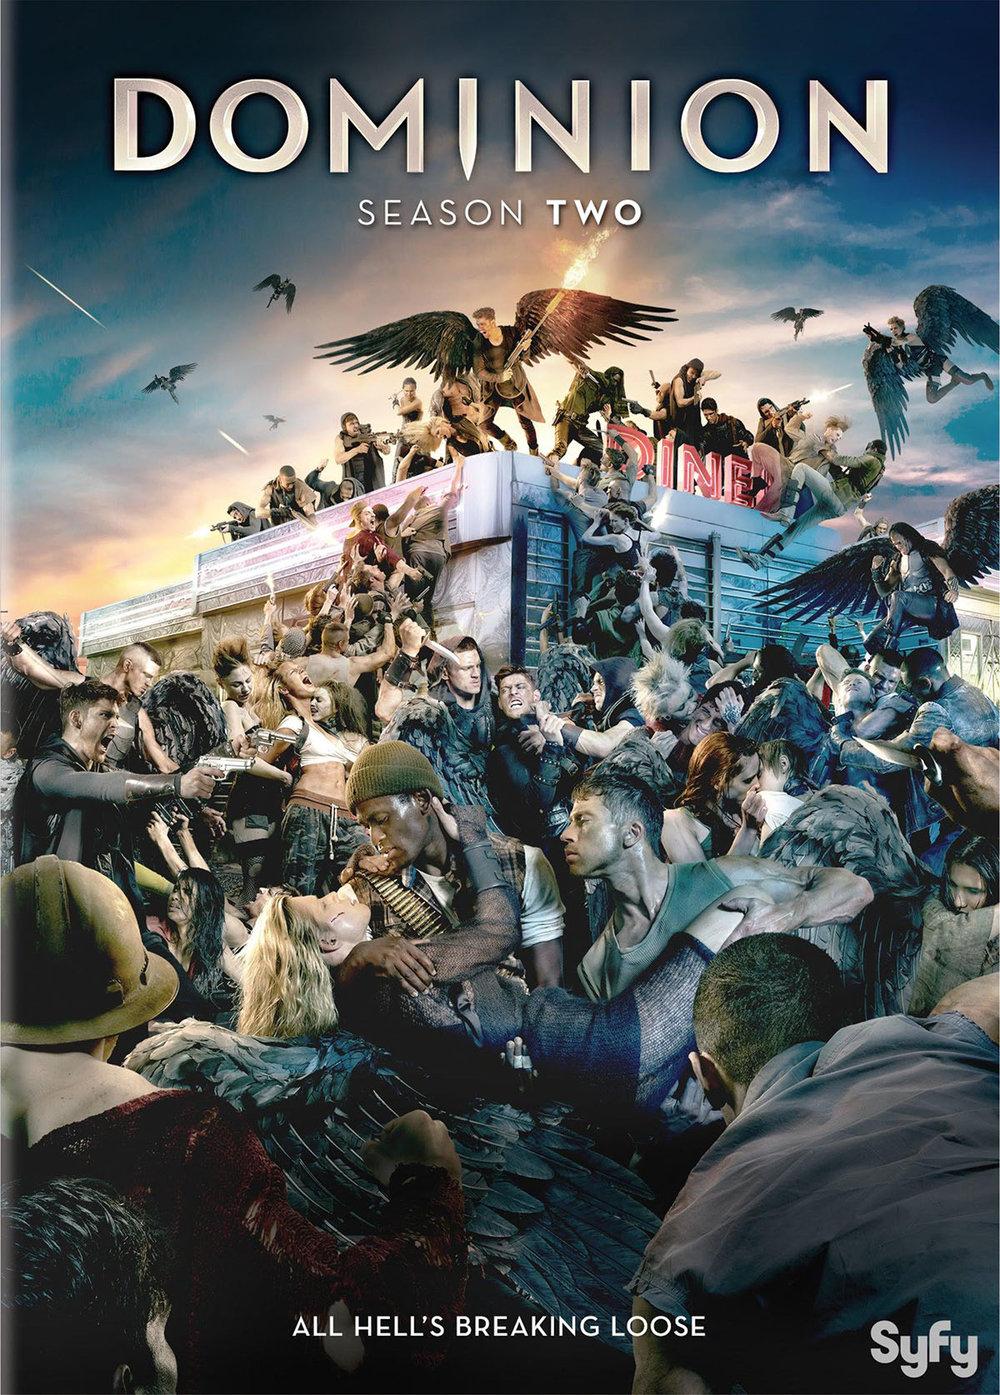 'Dominion' TV Series Season 2 DVD cover